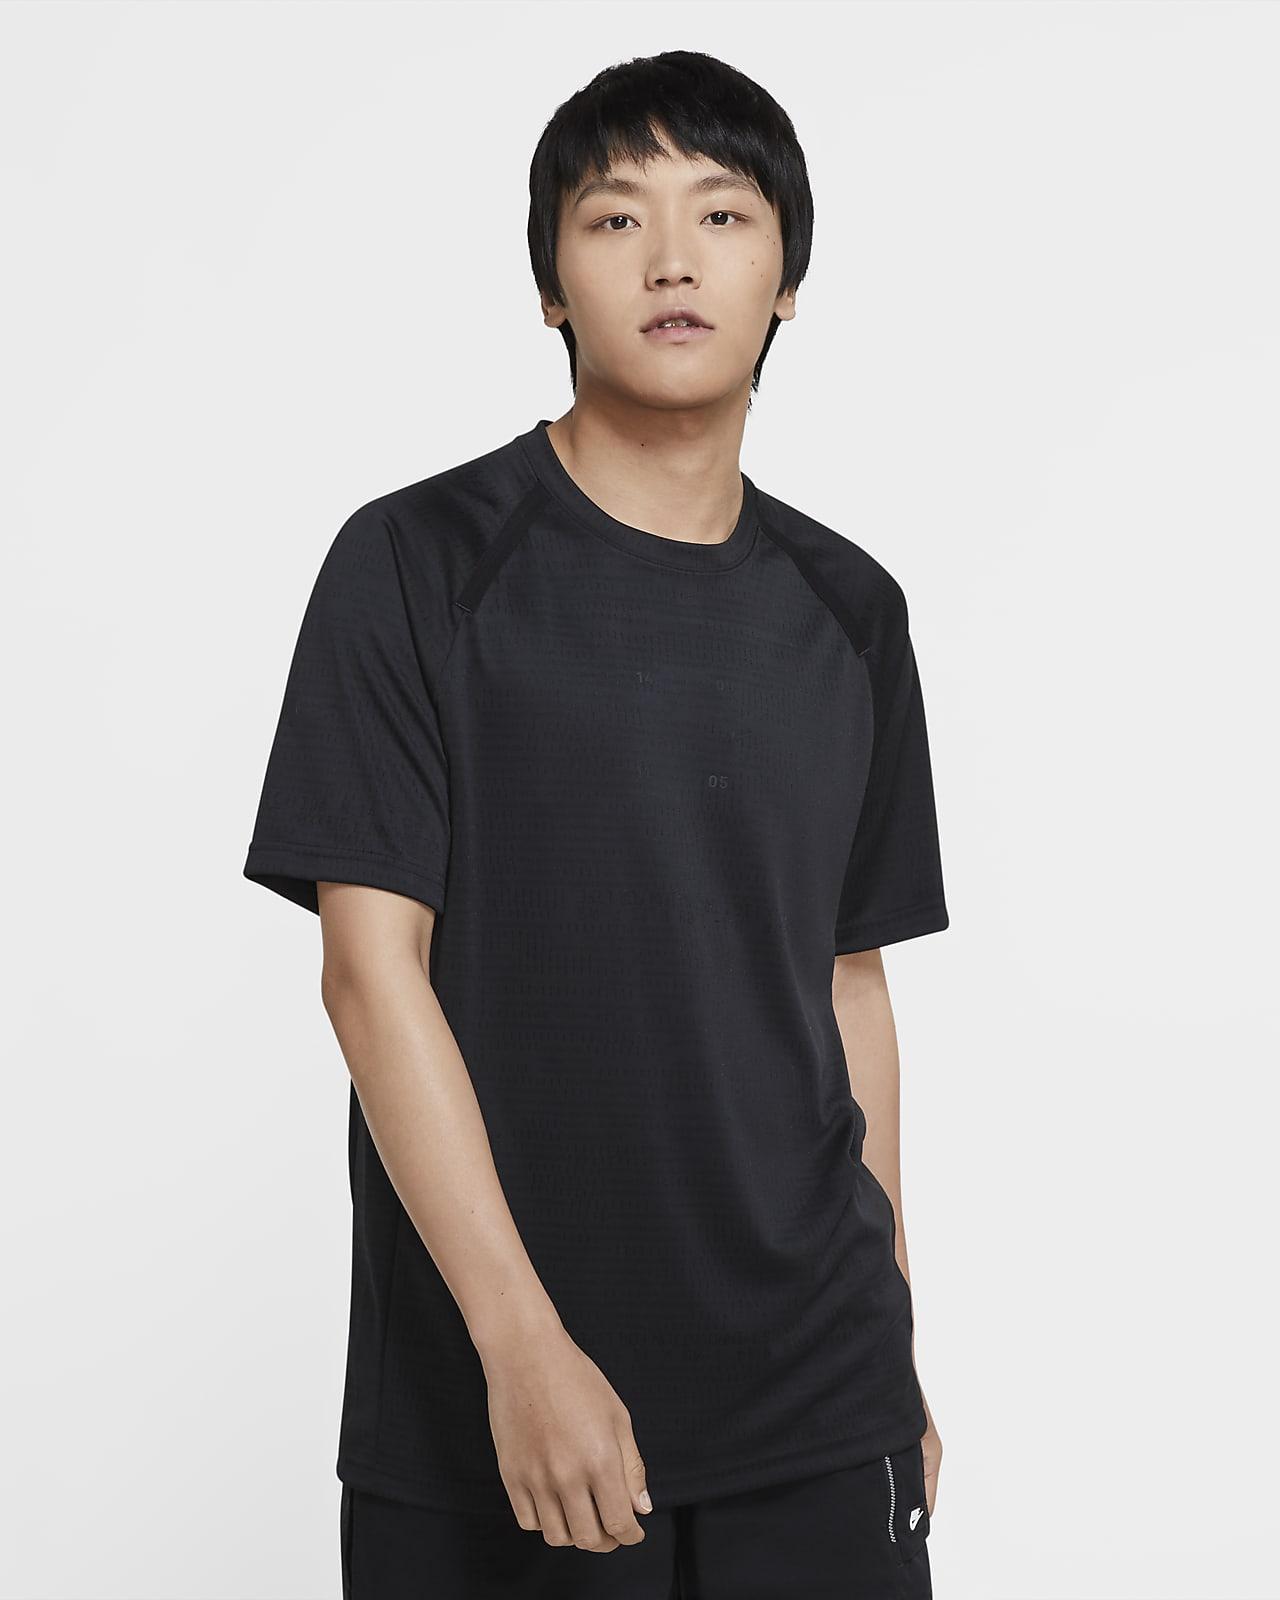 Nike Sportswear Tech Pack 男款 Engineered 短袖上衣